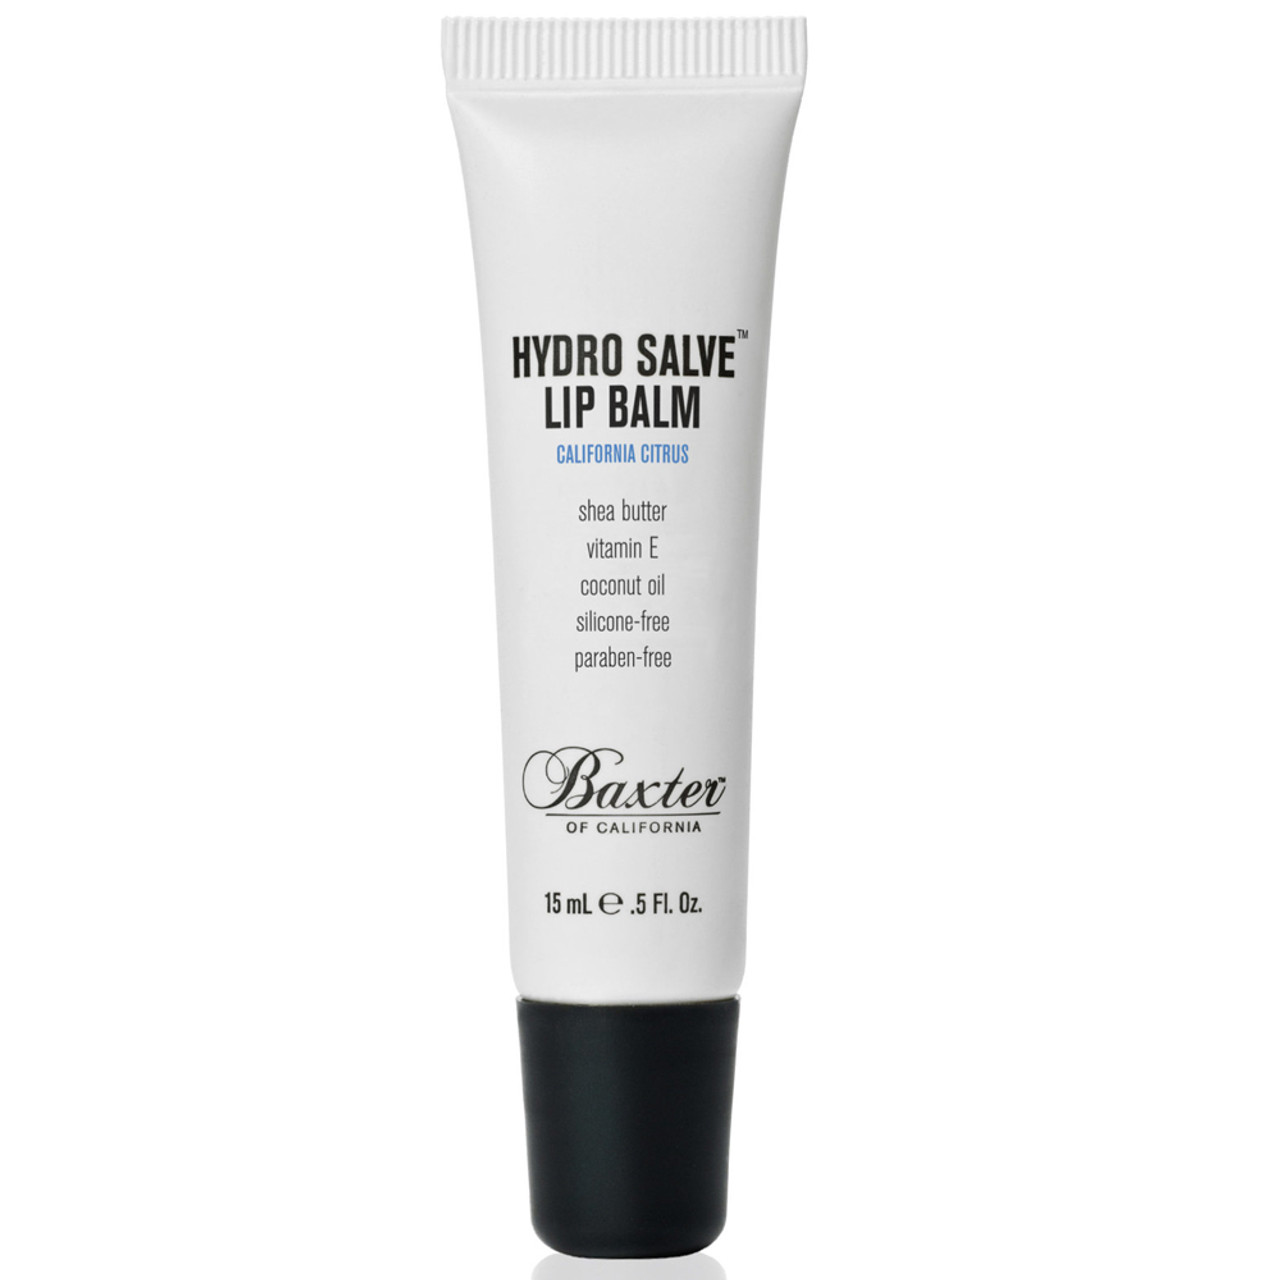 Baxter of California Hydro Salve Lip Balm BeautifiedYou.com